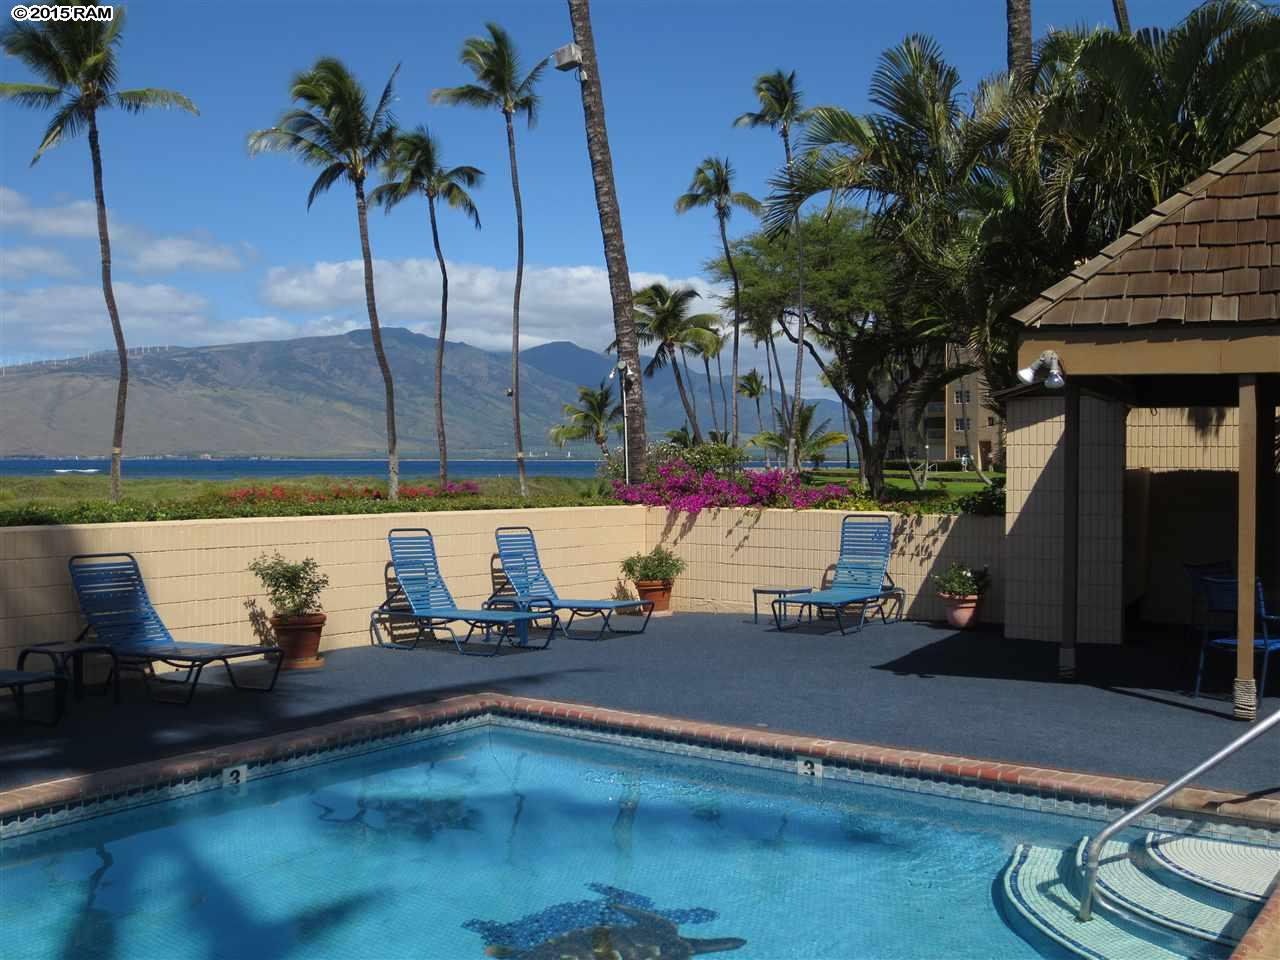 kihei condo sold koa lagoon unit 602  maui  hawaii homes for rent in maui hawaii on the beach